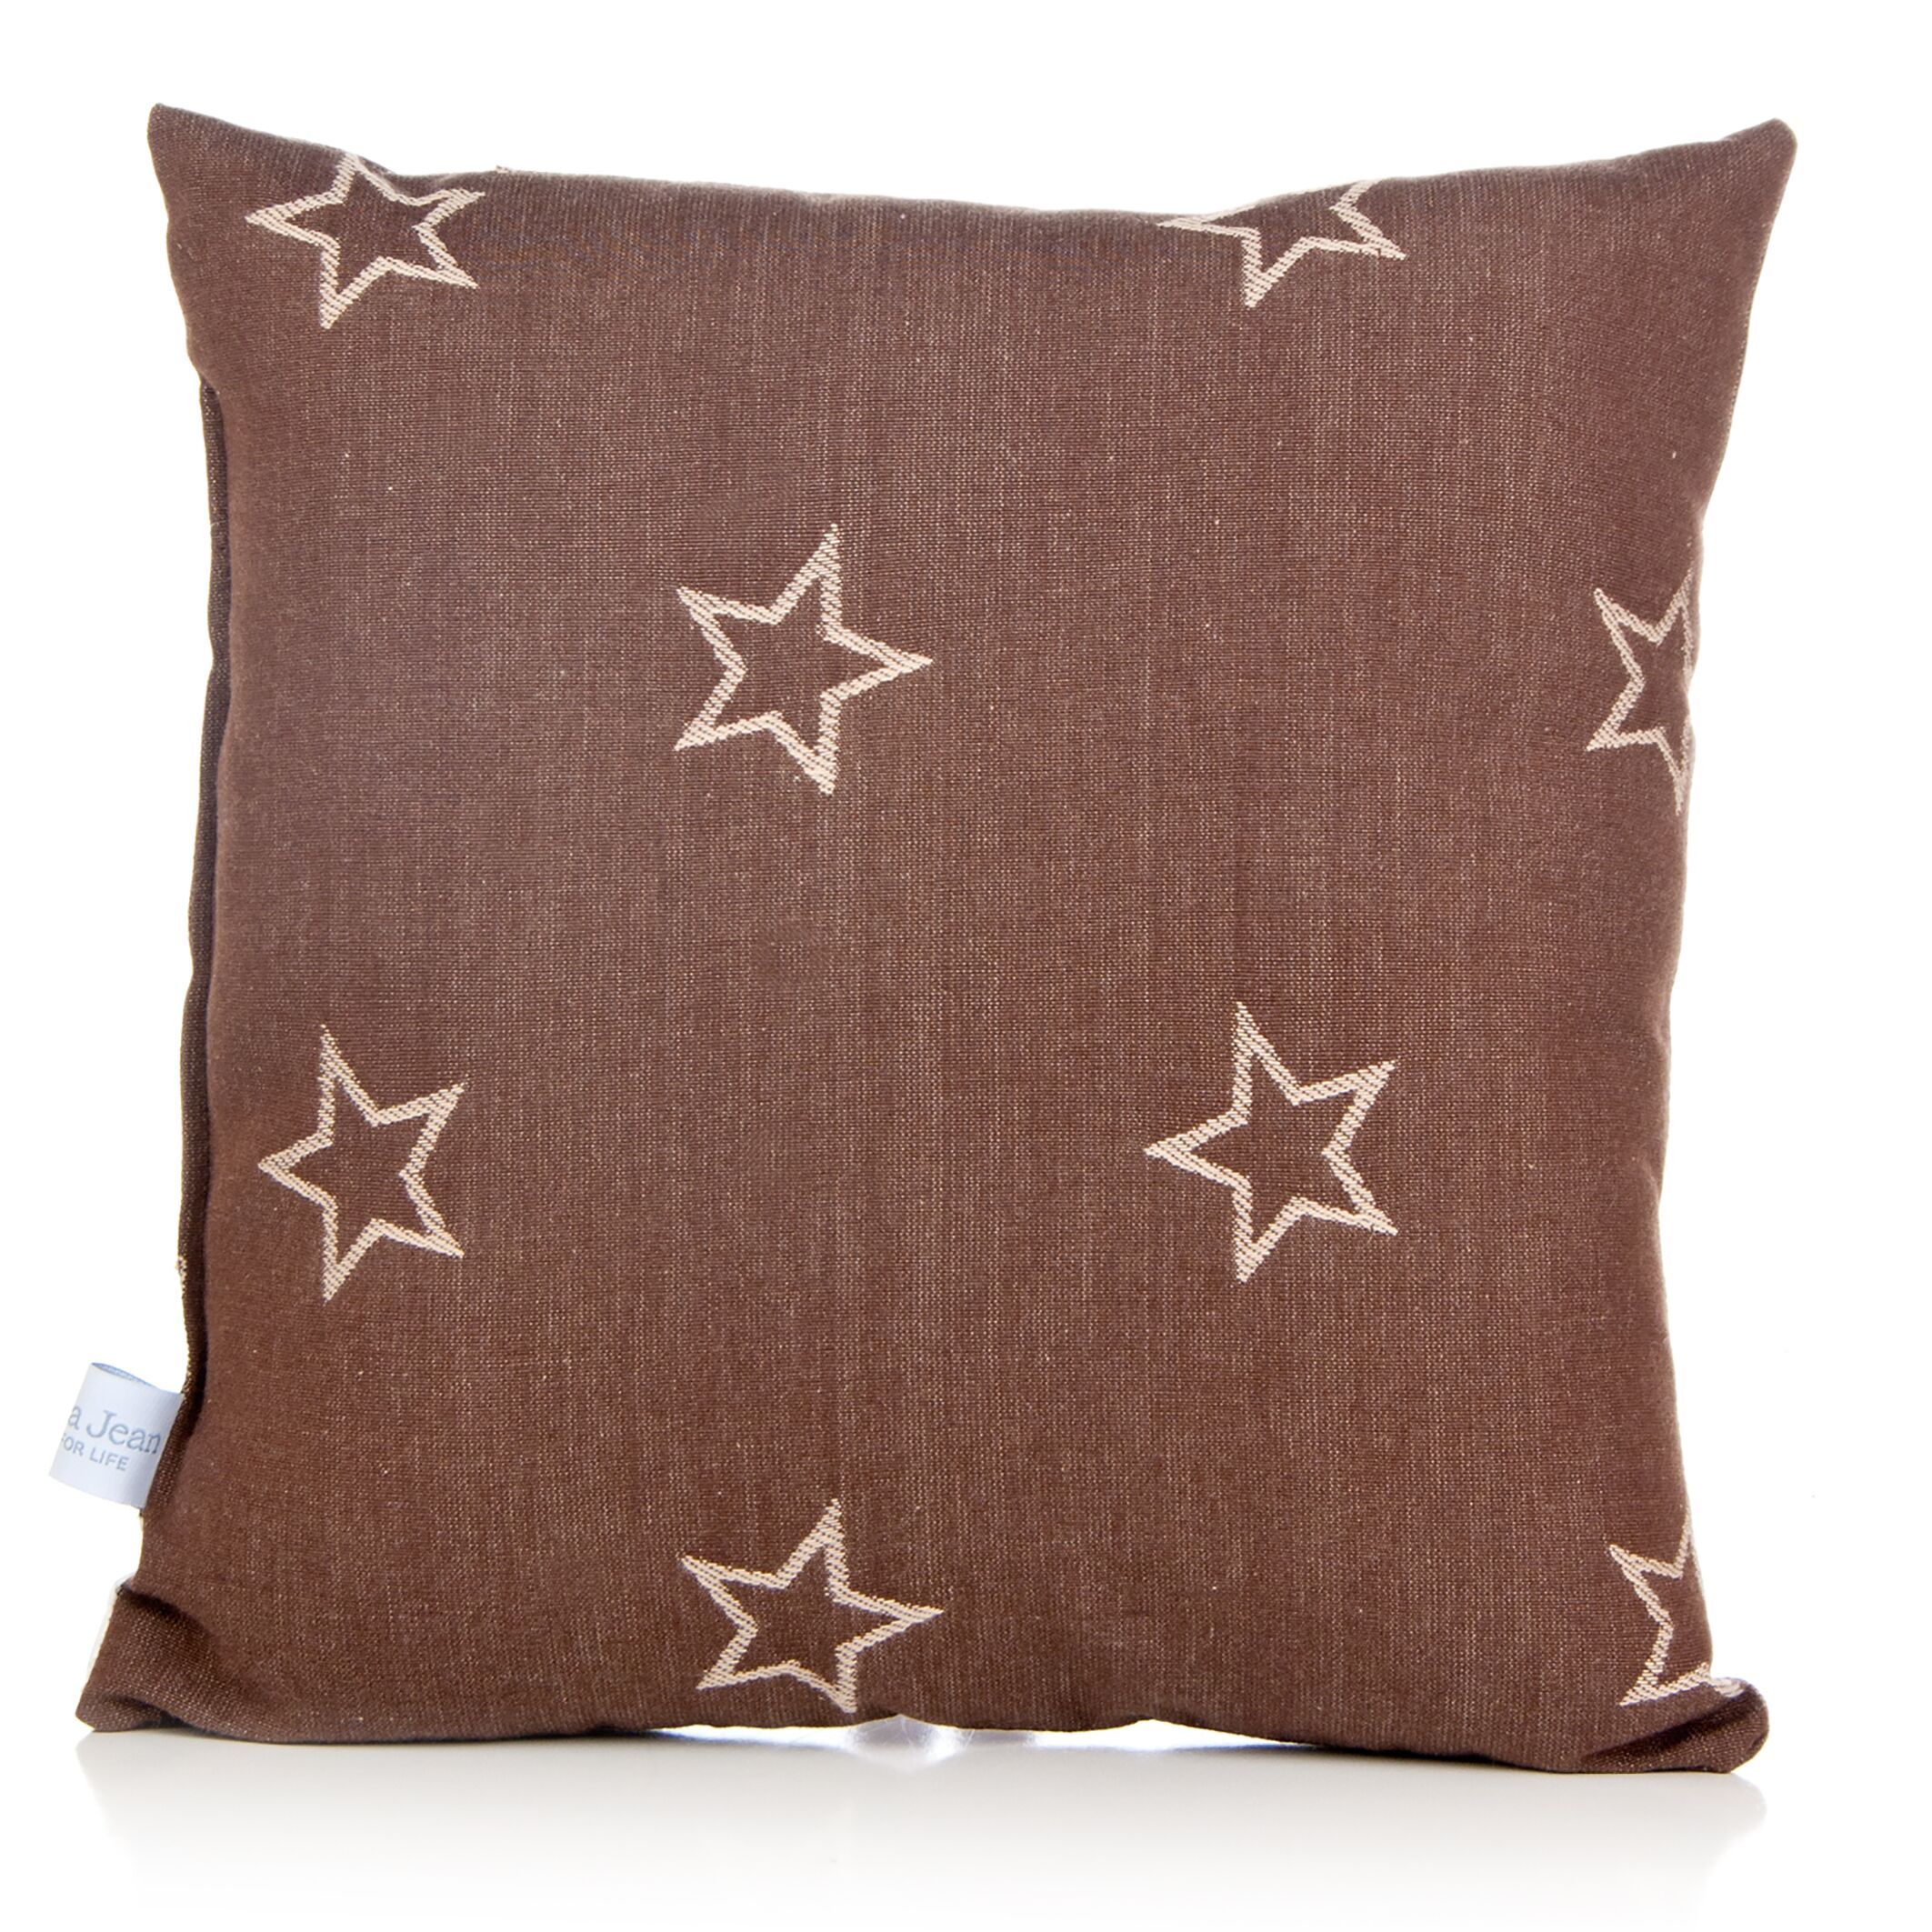 Dunecrest Denim Star Cotton Throw Pillow